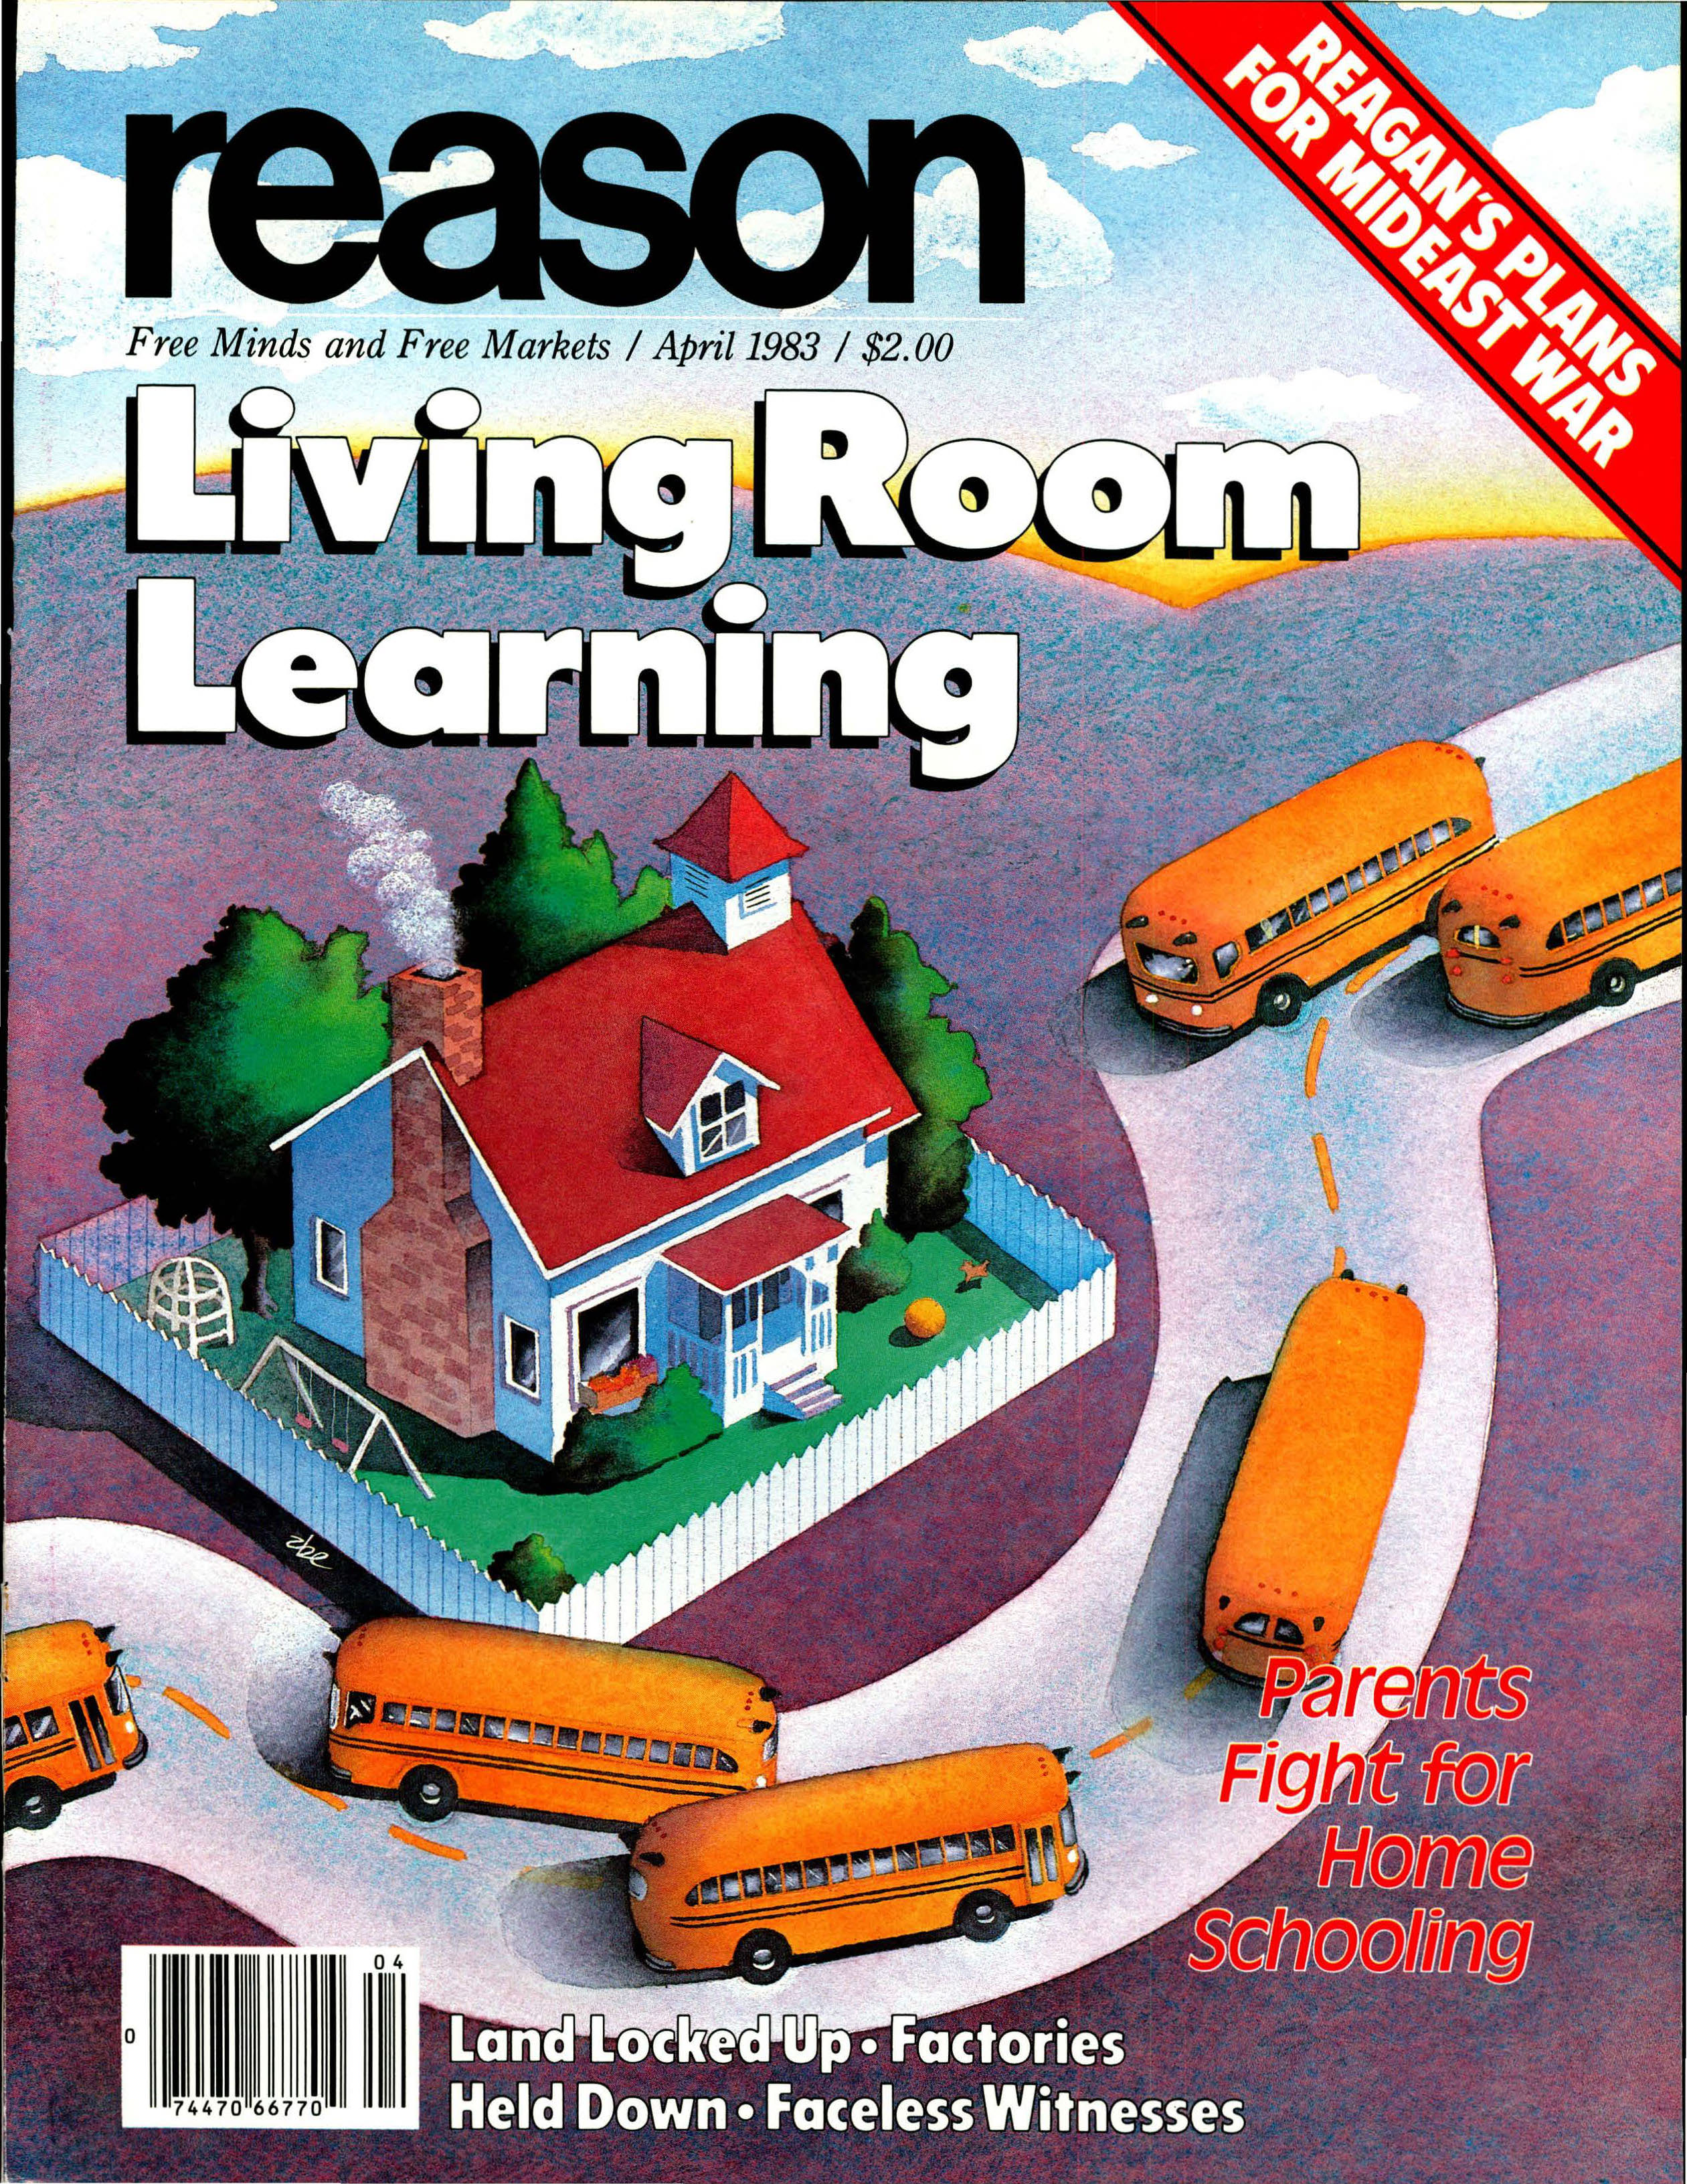 Reason Magazine, April 1983 cover image